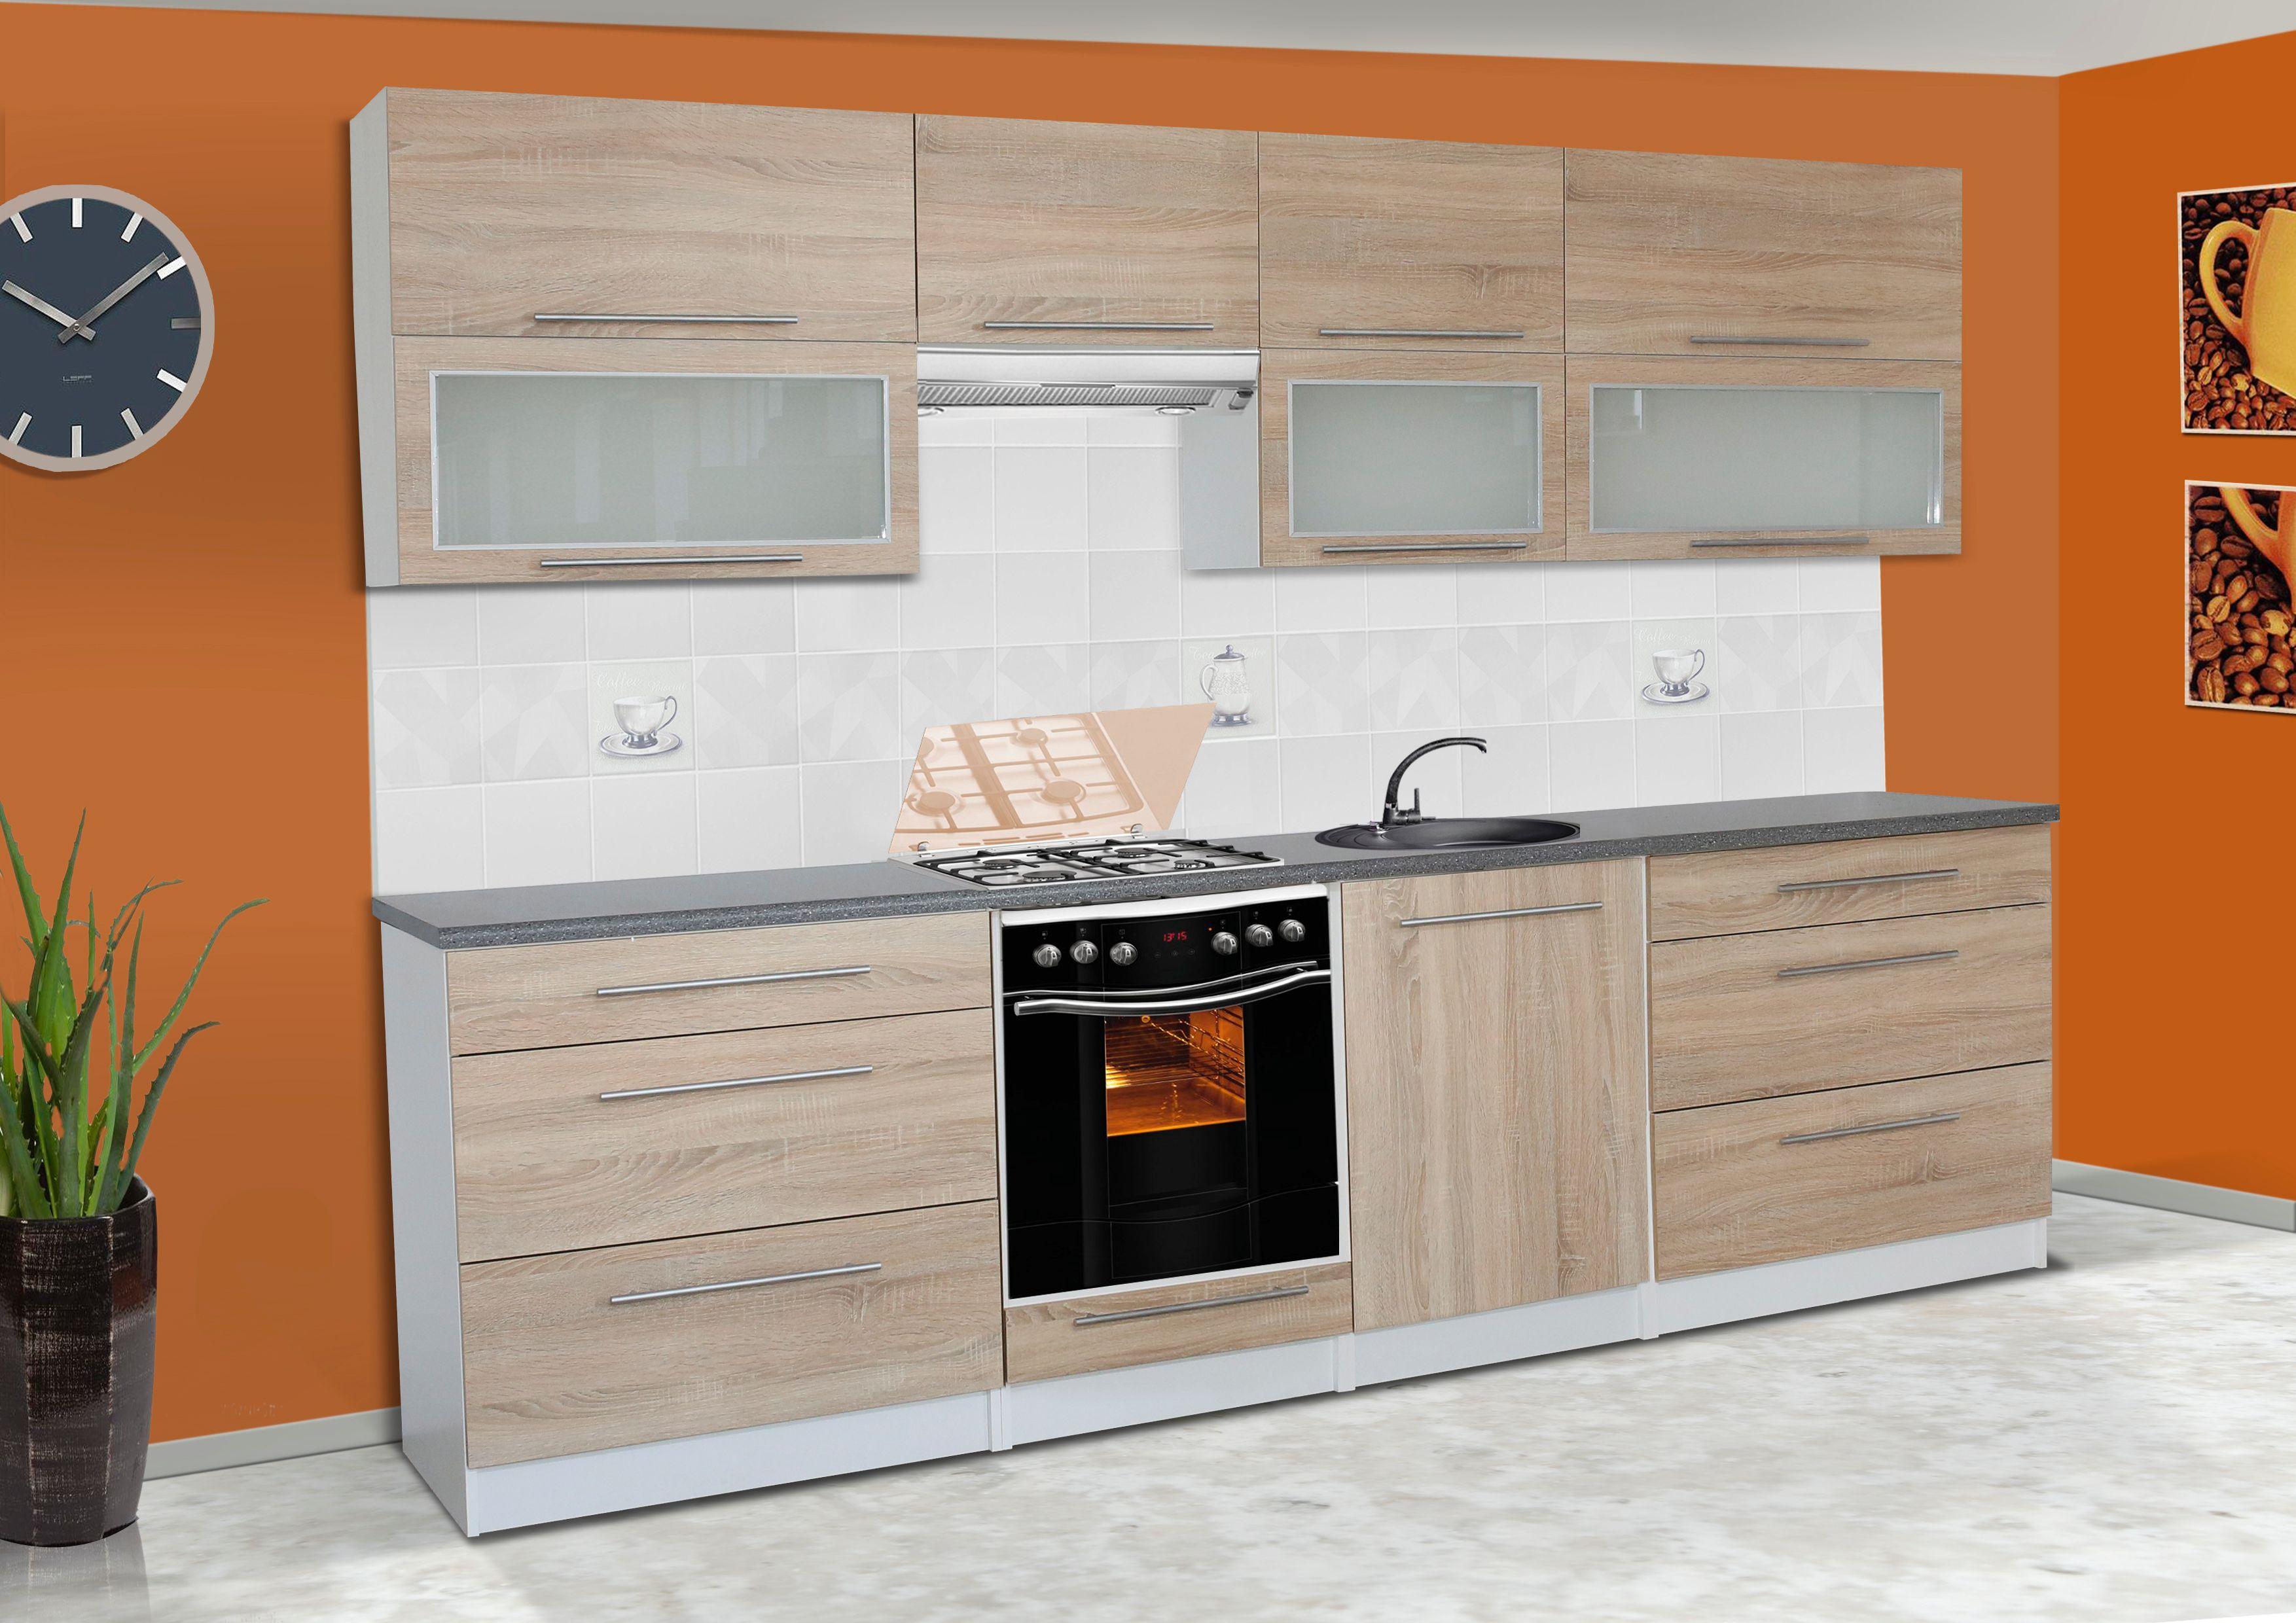 k che k chenzeile k chenblock sonoma 280 cm arbeitsplatte relinggriffe ebay. Black Bedroom Furniture Sets. Home Design Ideas